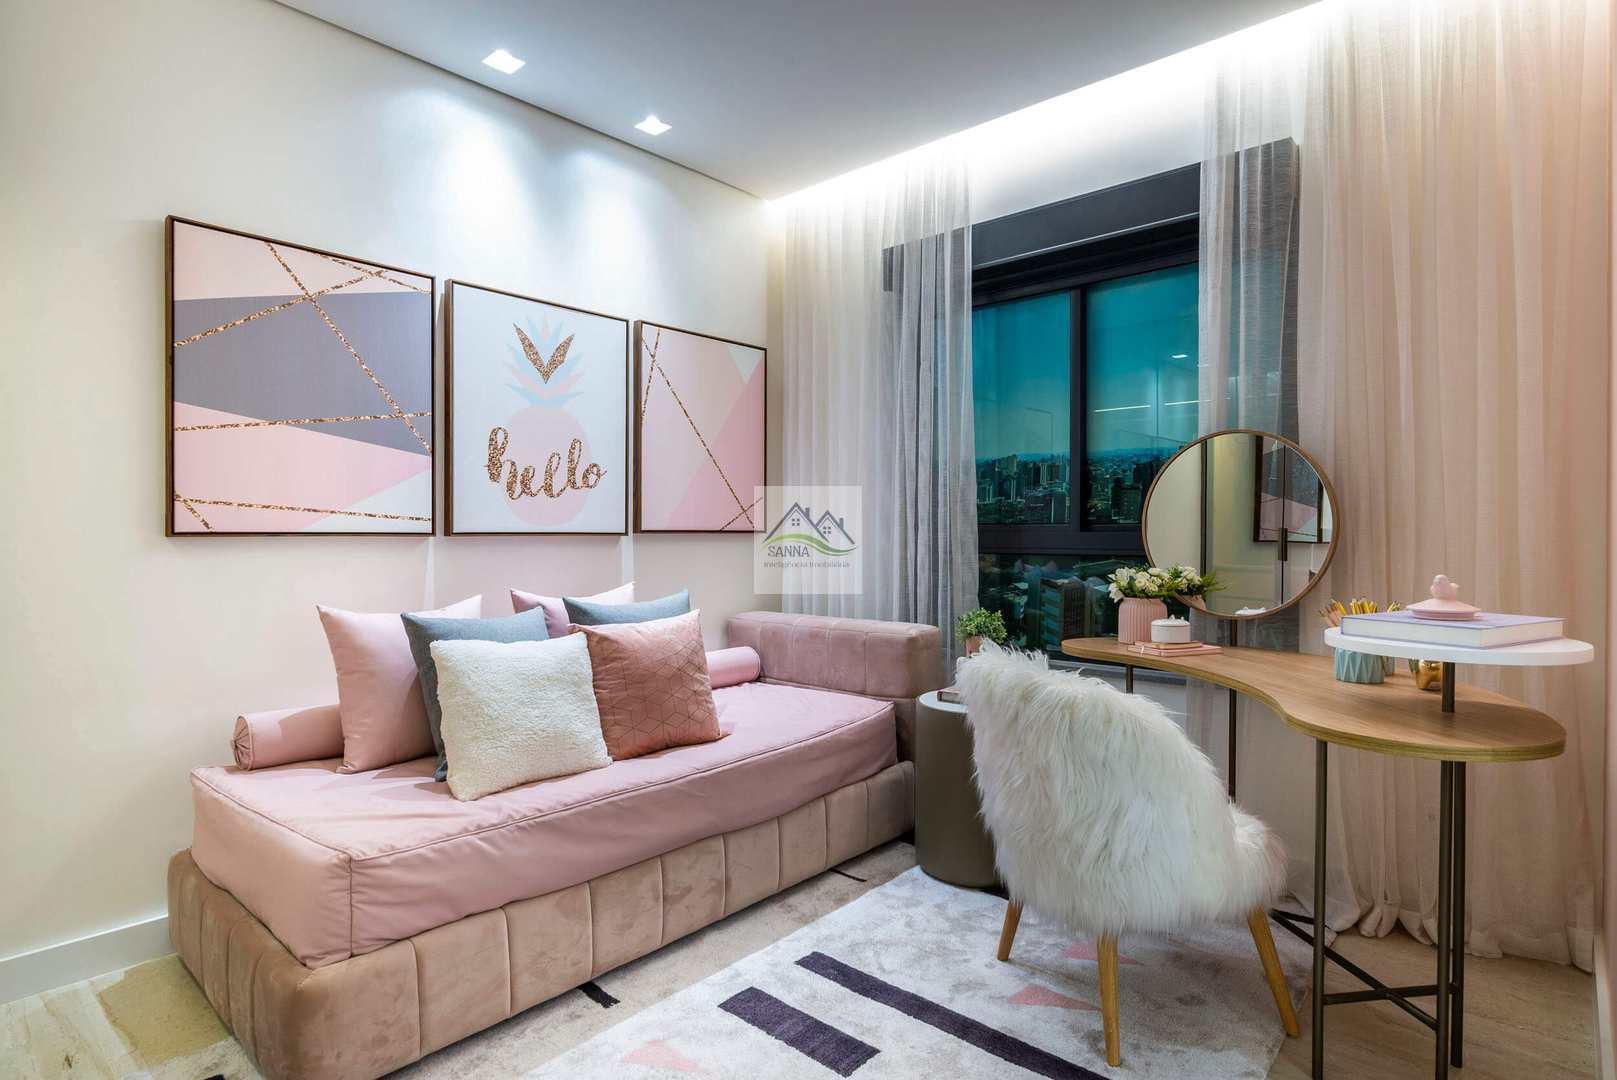 Apartamento com 2 dorms, Savassi, Belo Horizonte - R$ 1.54 mi, Cod: SN202127